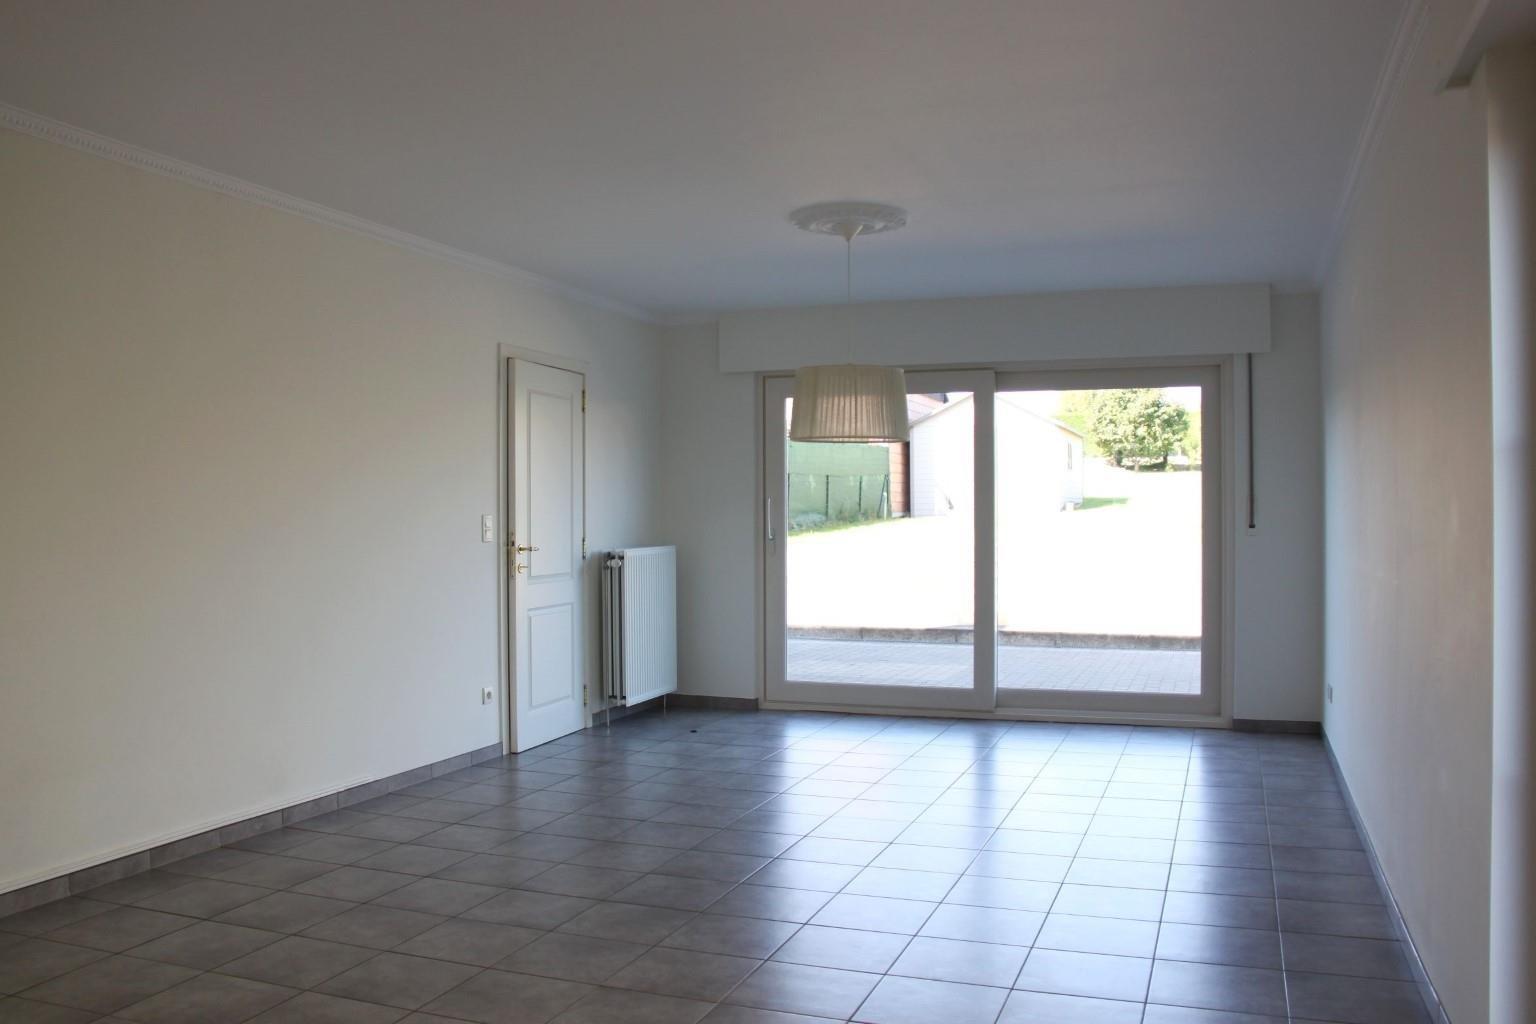 A997W5202103121203/a969b7be42954242a8ef161496b49a24/livingroom2.jpg